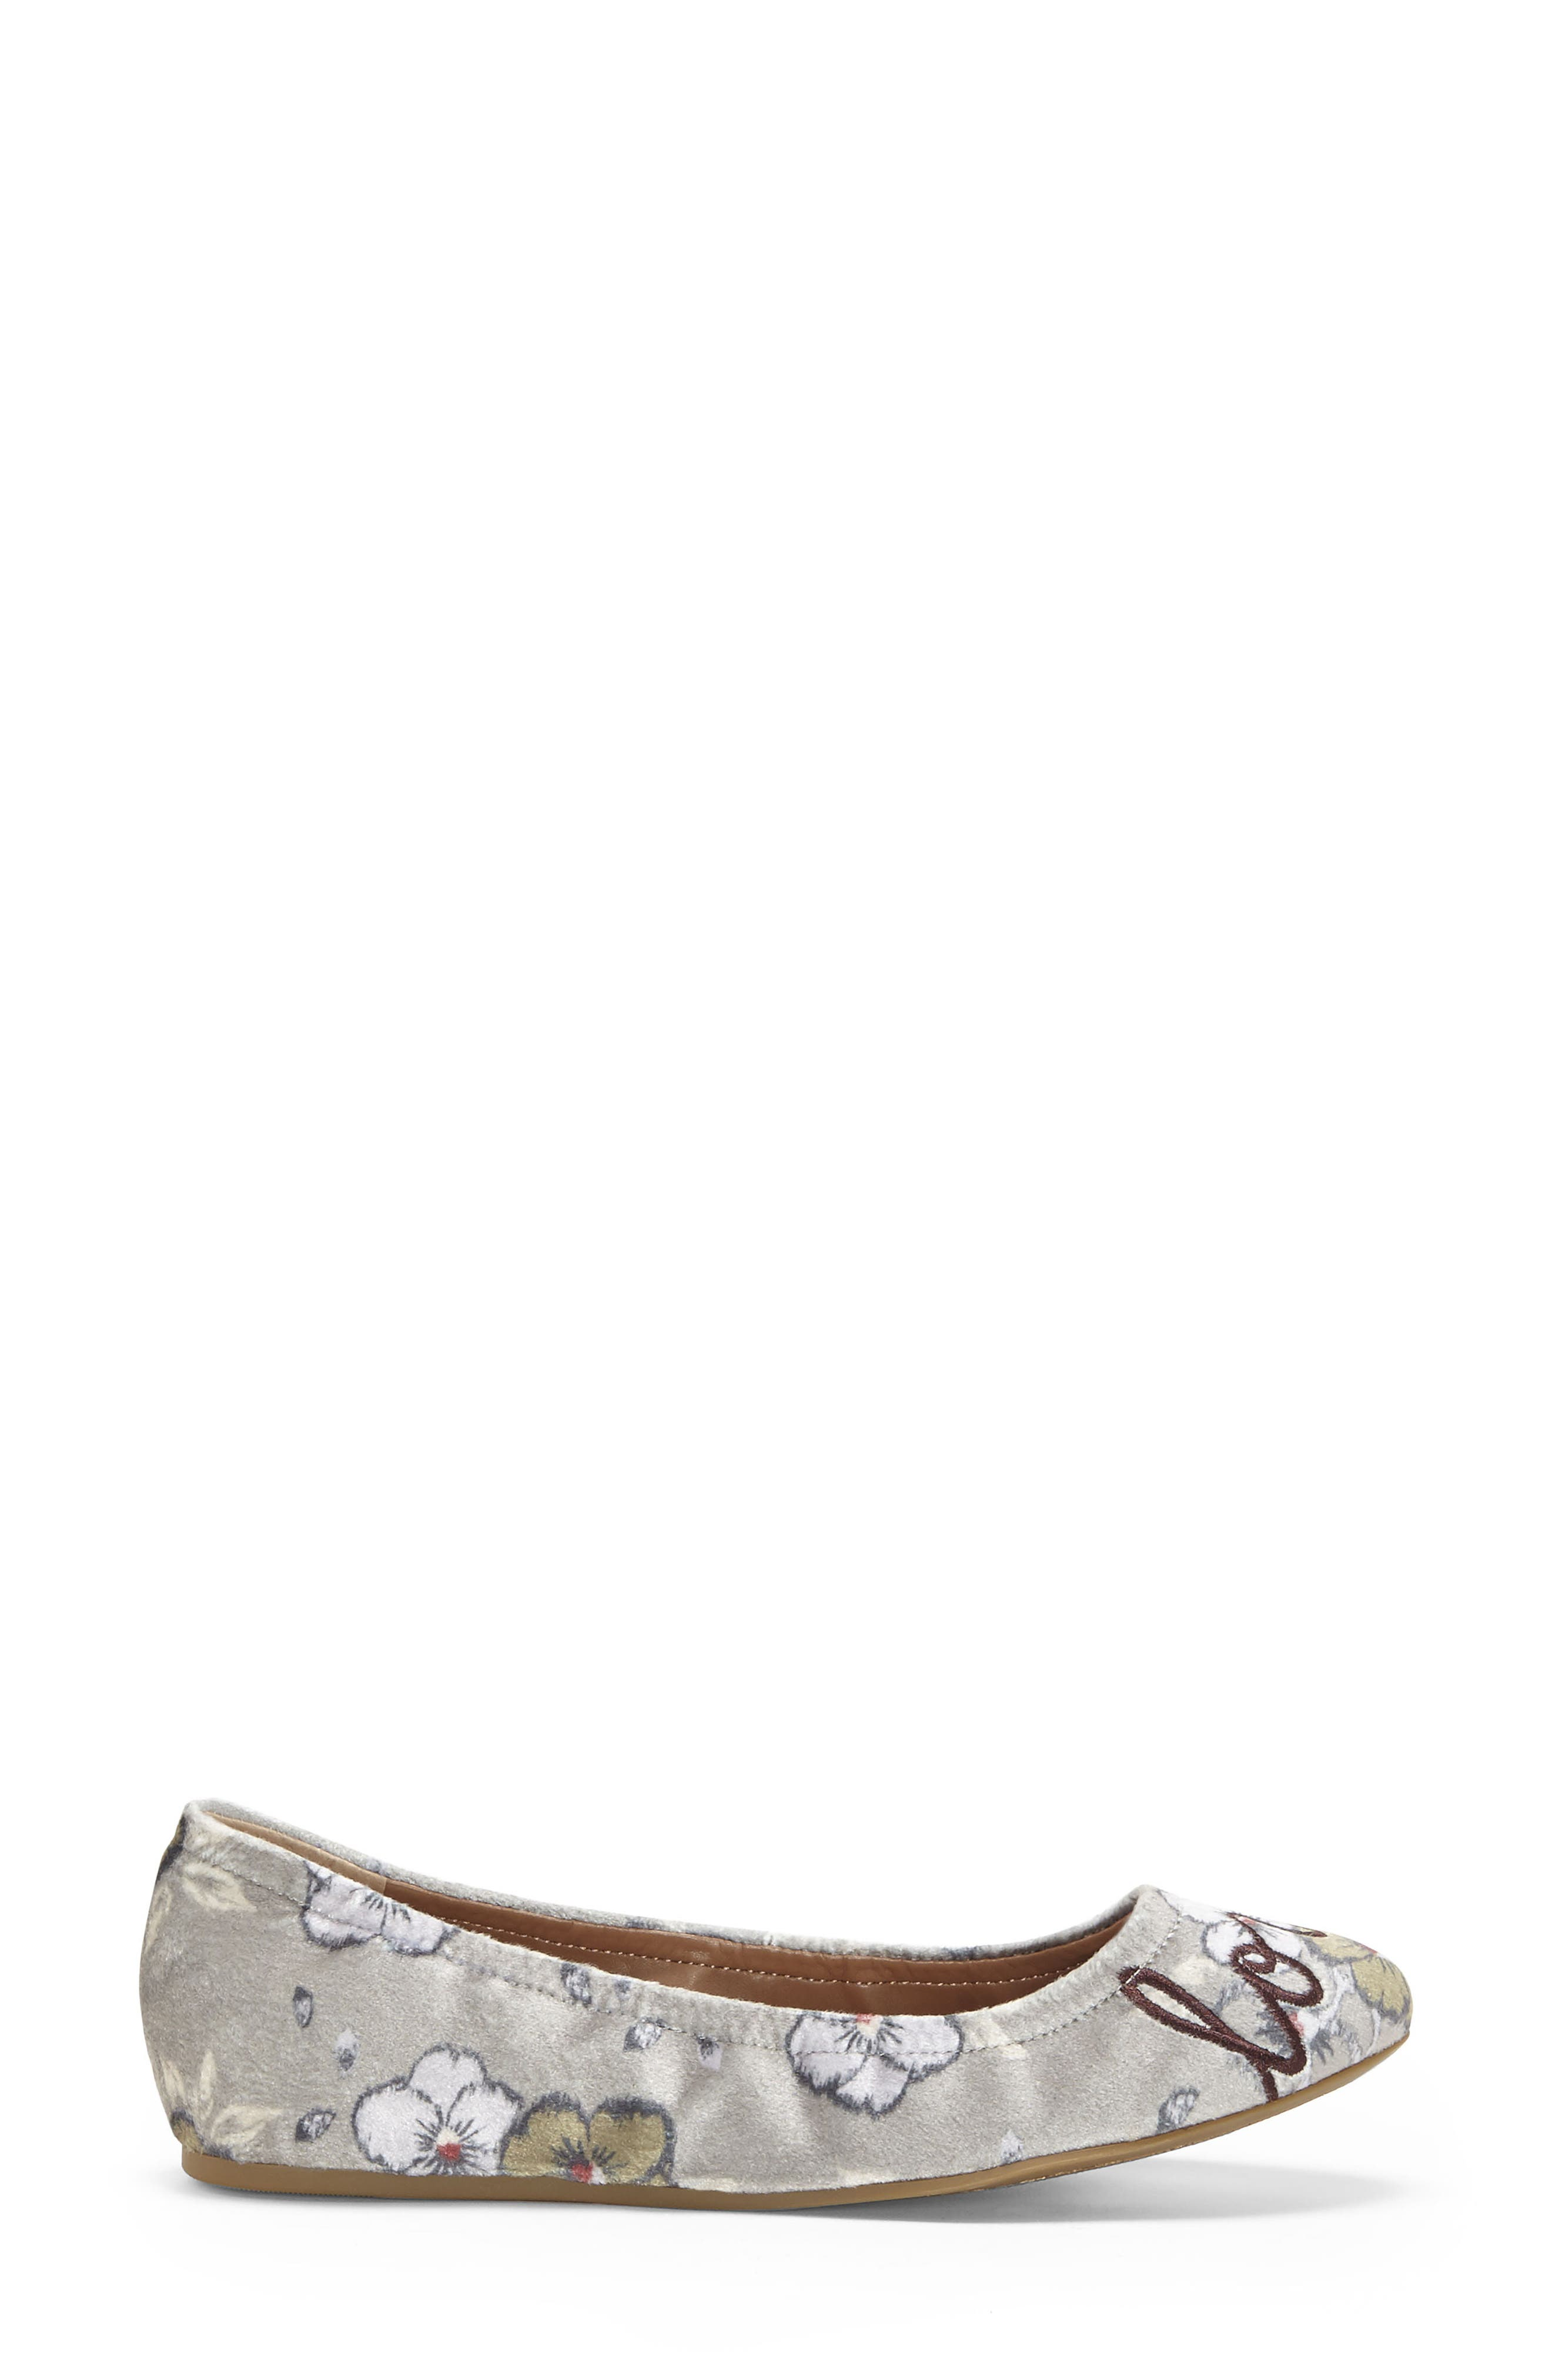 'Langston' Ballet Flat,                             Alternate thumbnail 4, color,                             Light Shadow Leather